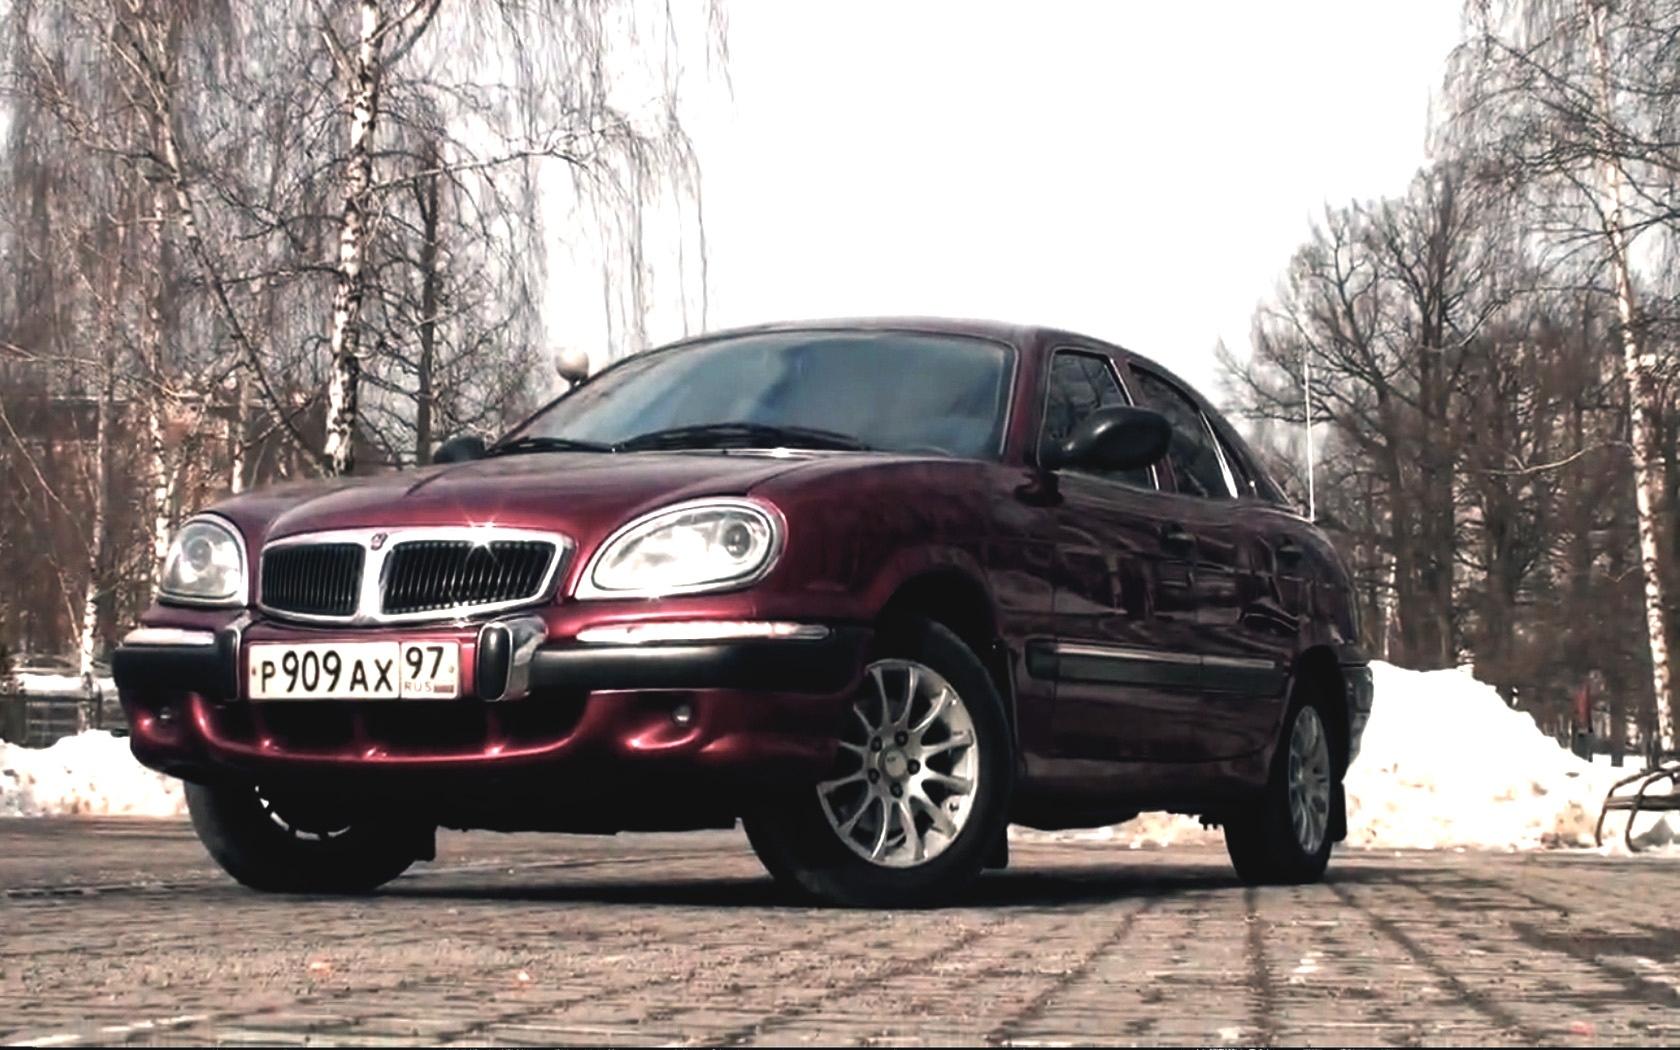 Gaz 3111 Volga Exclusive Winter Cars   Stock Photos Images 1680x1050